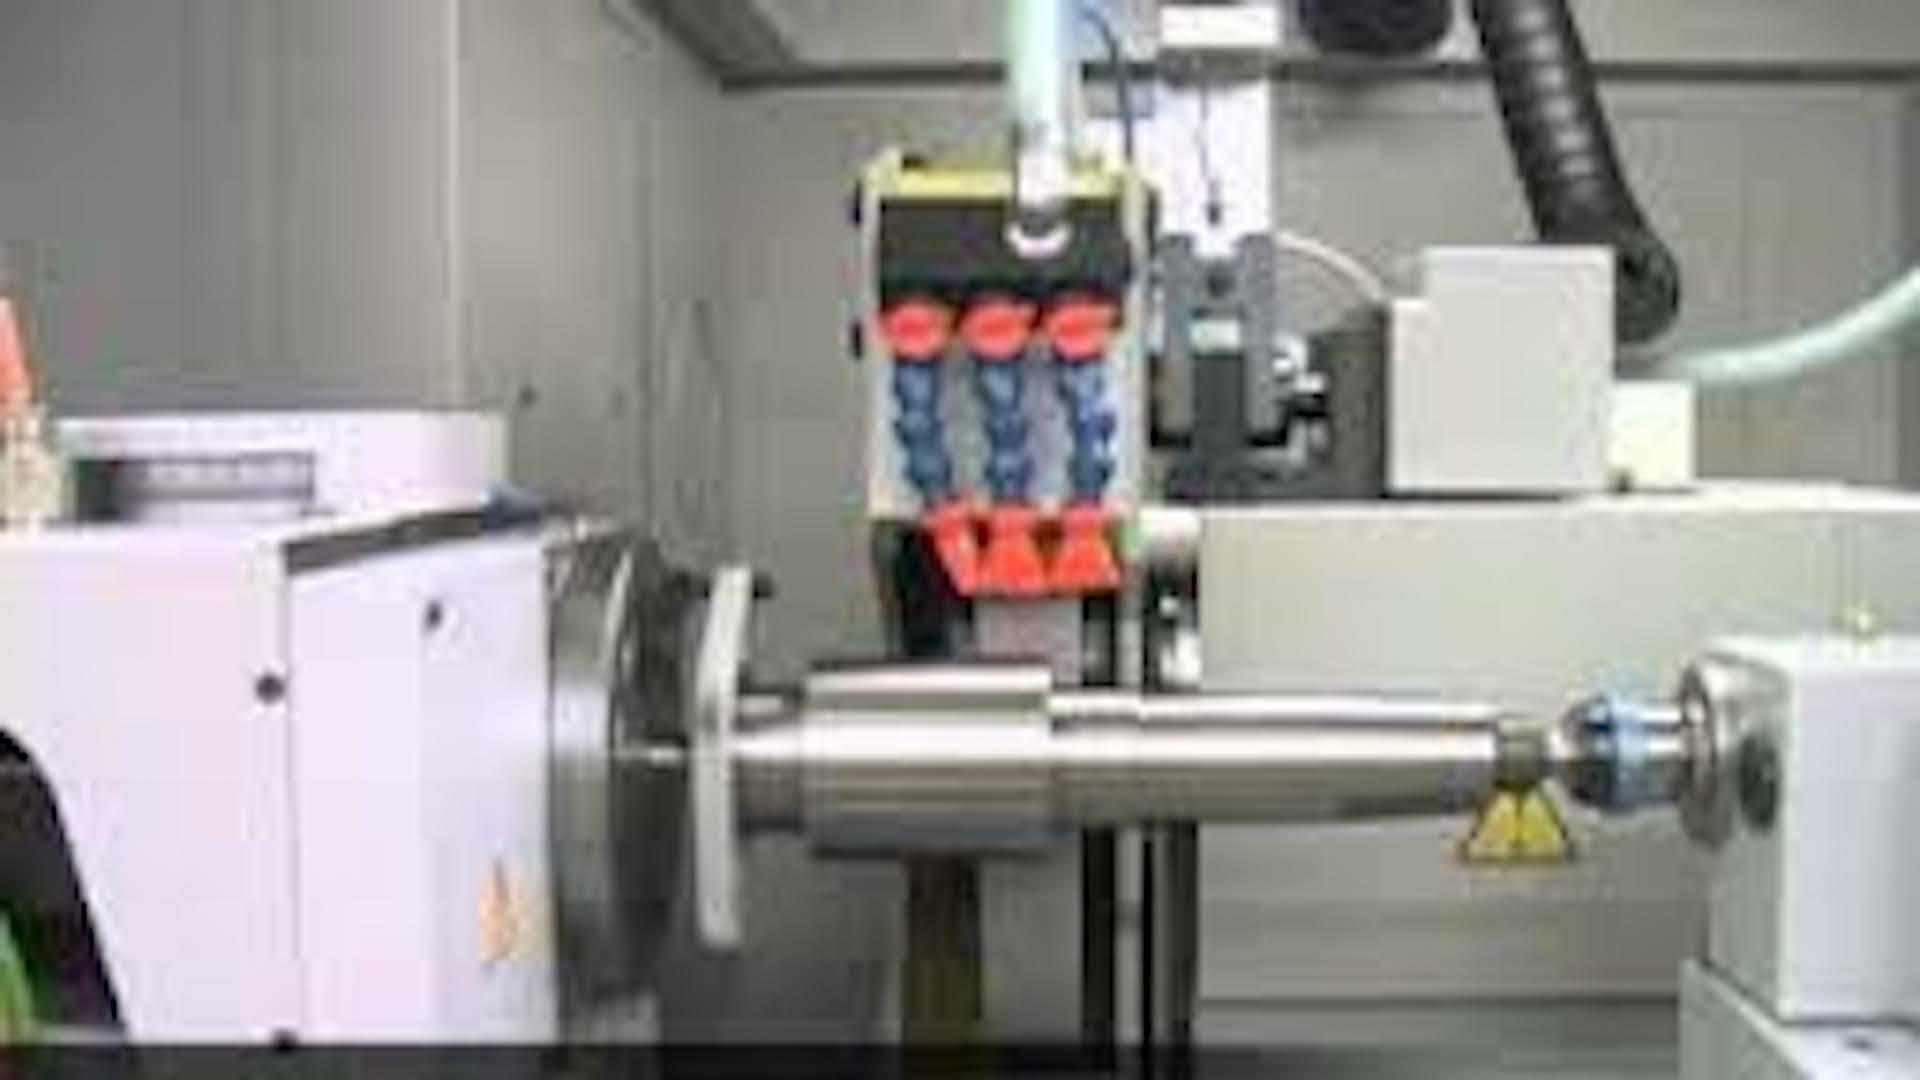 https://www.taylor-engineering.co.uk/wp-content/uploads/capabilities/grinding/jones-and-hipman-suprema-internal-view.jpeg